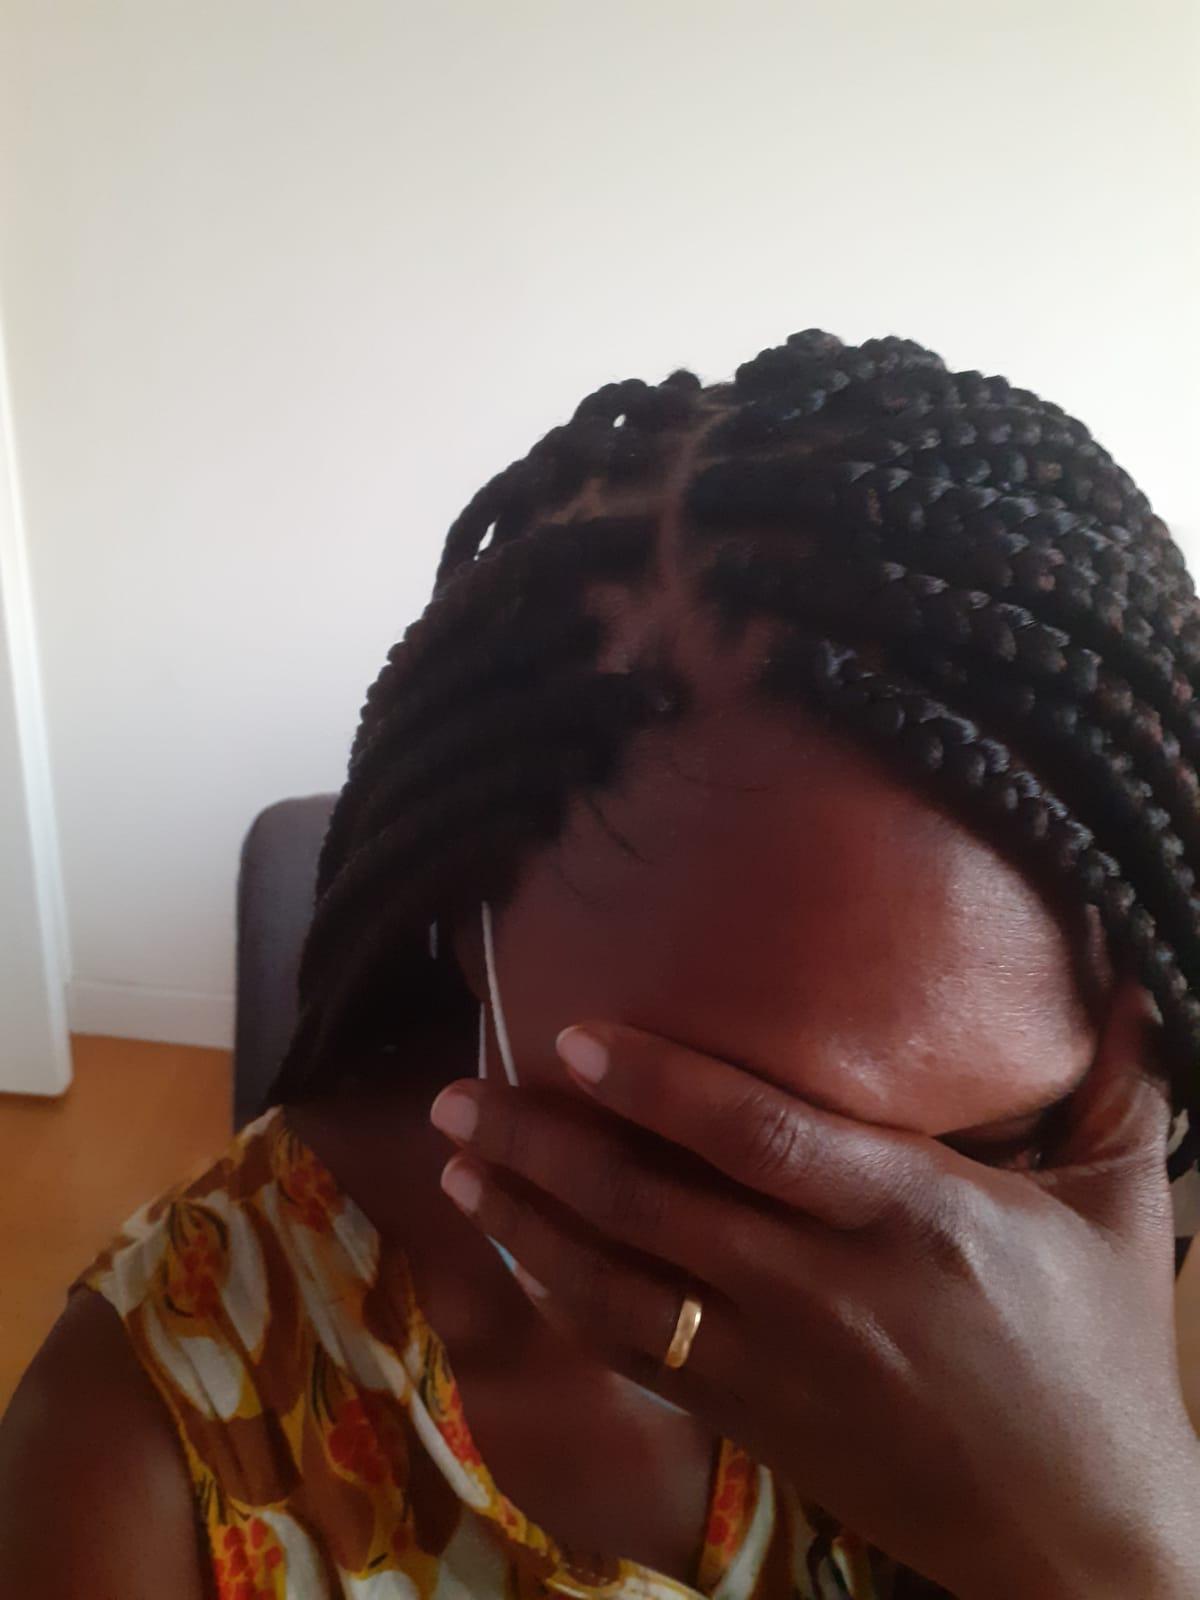 salon de coiffure afro tresse tresses box braids crochet braids vanilles tissages paris 75 77 78 91 92 93 94 95 FNXTIDDJ